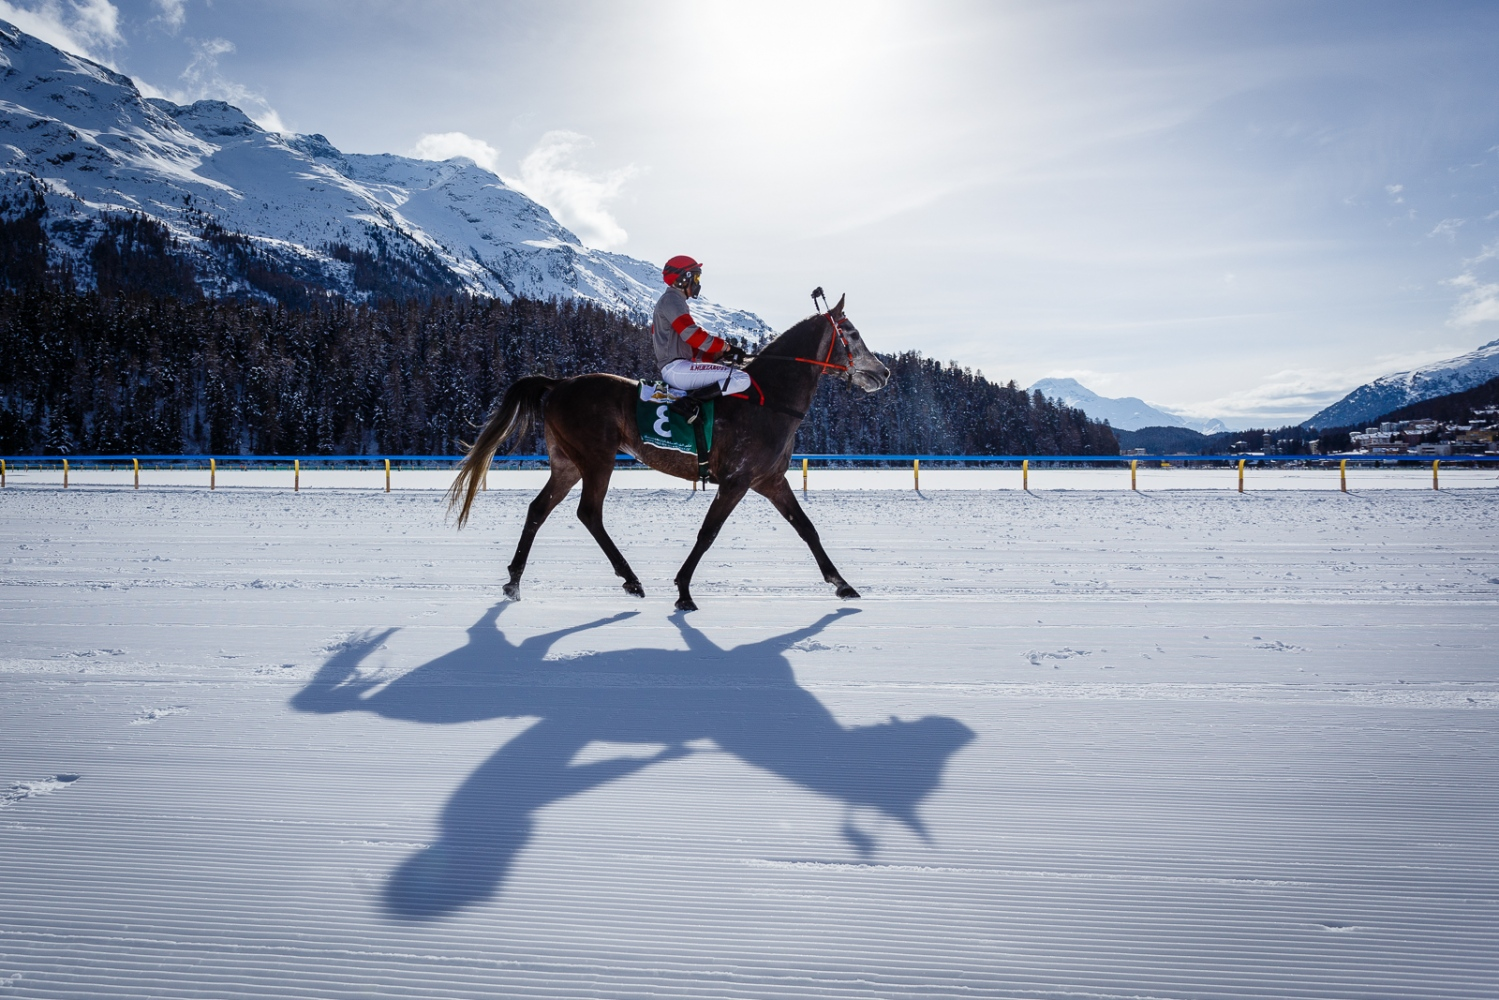 White Turf Races 2017 The White Turf Races 2017 in Sankt Moritz